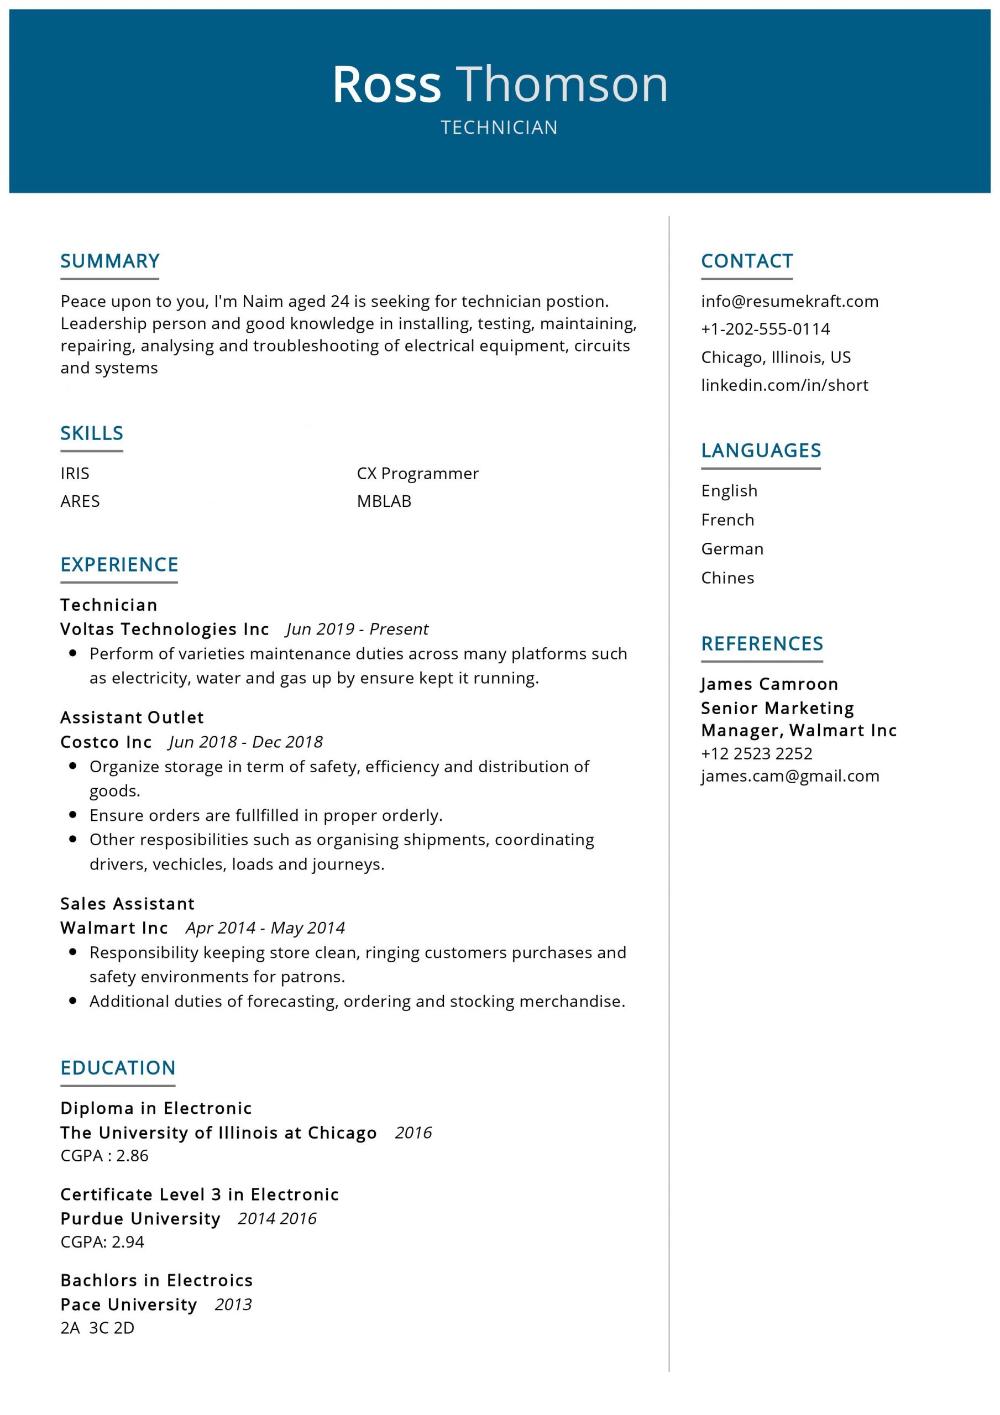 100 Professional Resume Samples For 2020 Resumekraft In 2020 Professional Resume Samples Resume Resume Examples